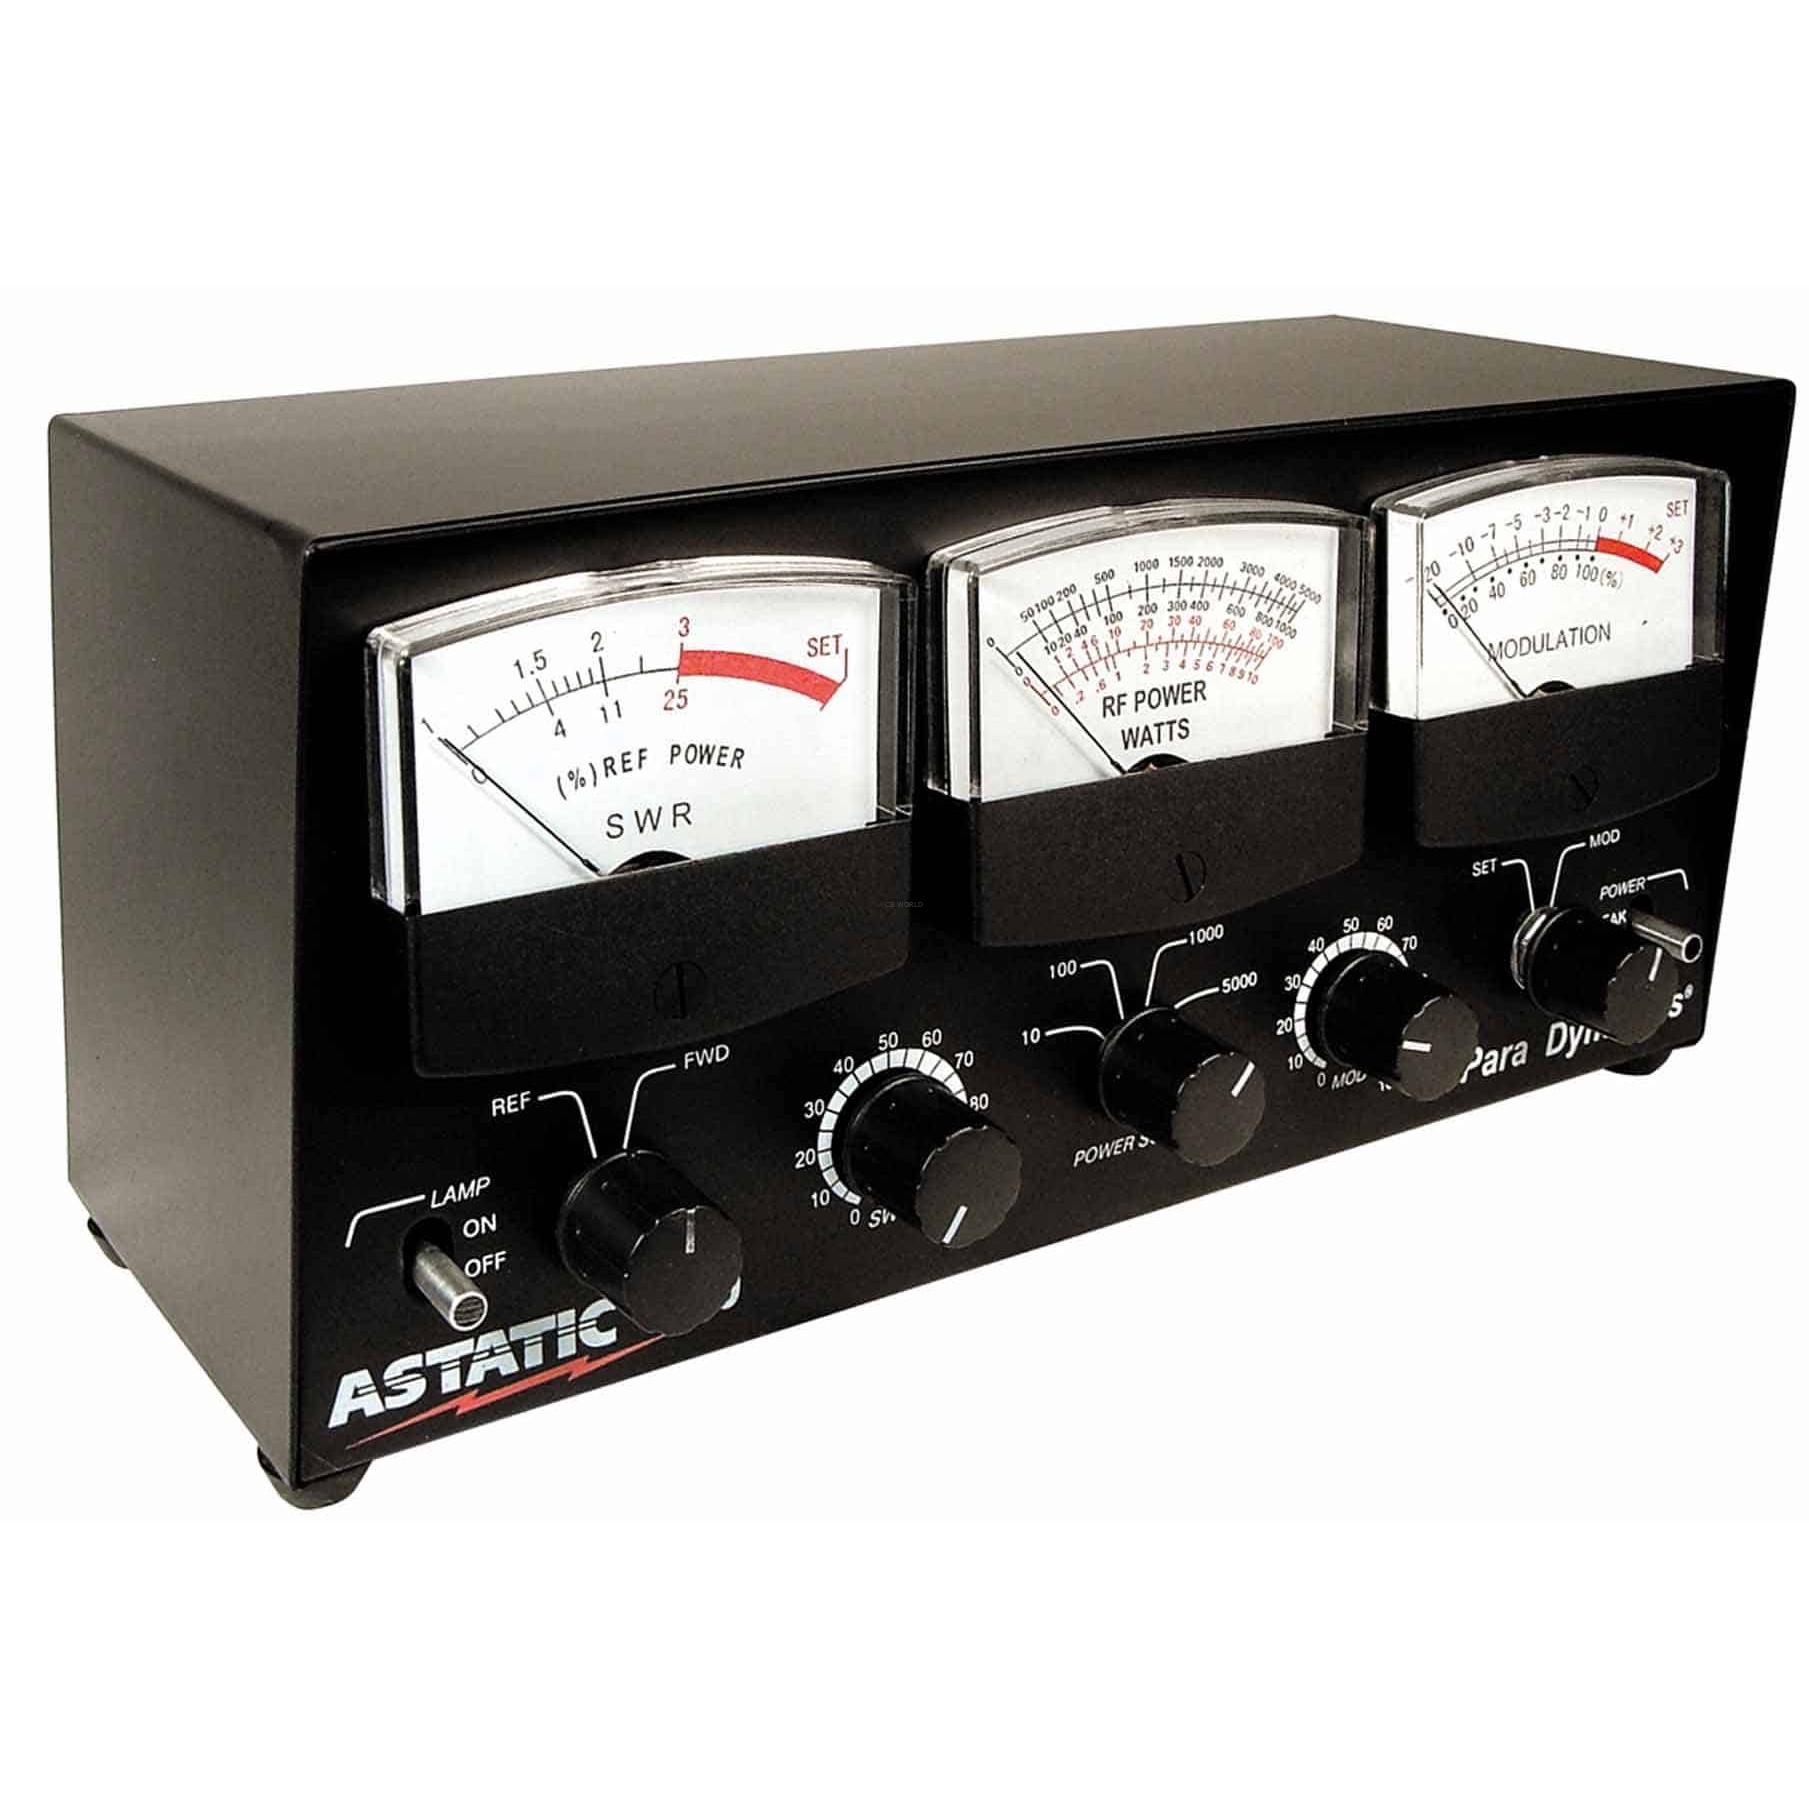 Watt Meter Price List: Astatic SWR Power And Modulation Meter